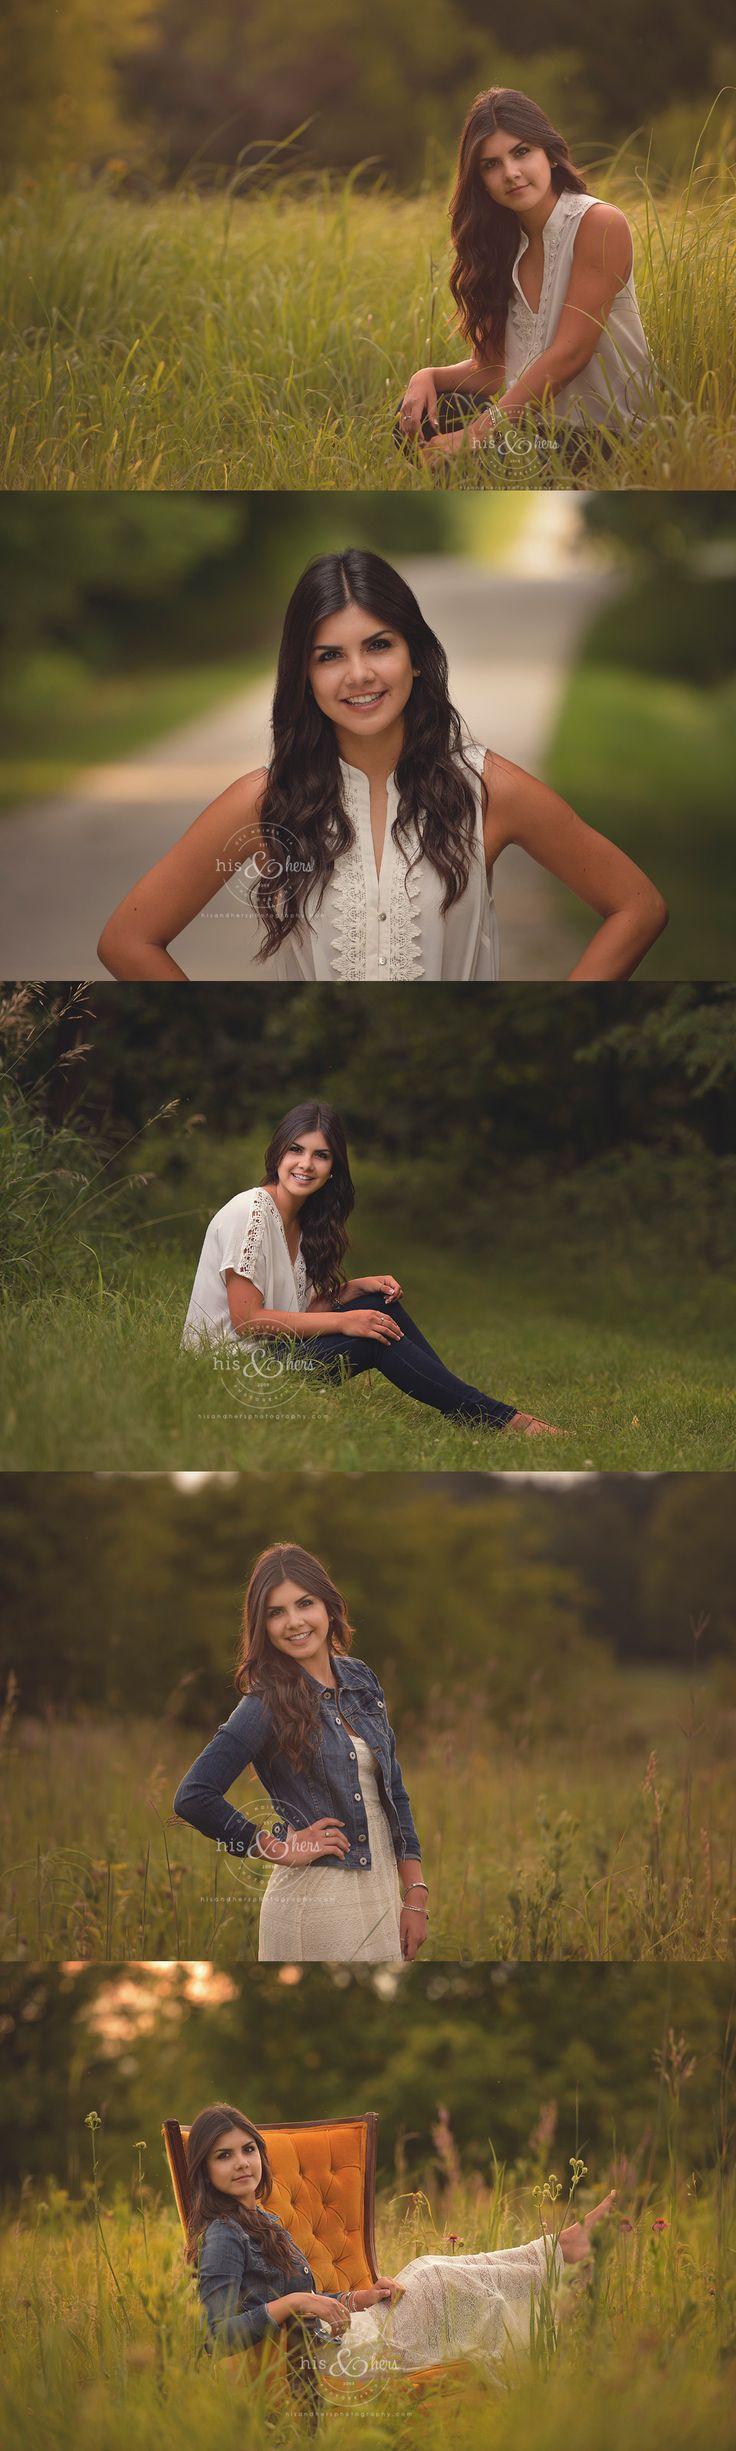 Des Moines, Iowa senior portrait photographer, Randy Milder   His & Hers   #seniorpictures #seniorpics   Senior Pictures